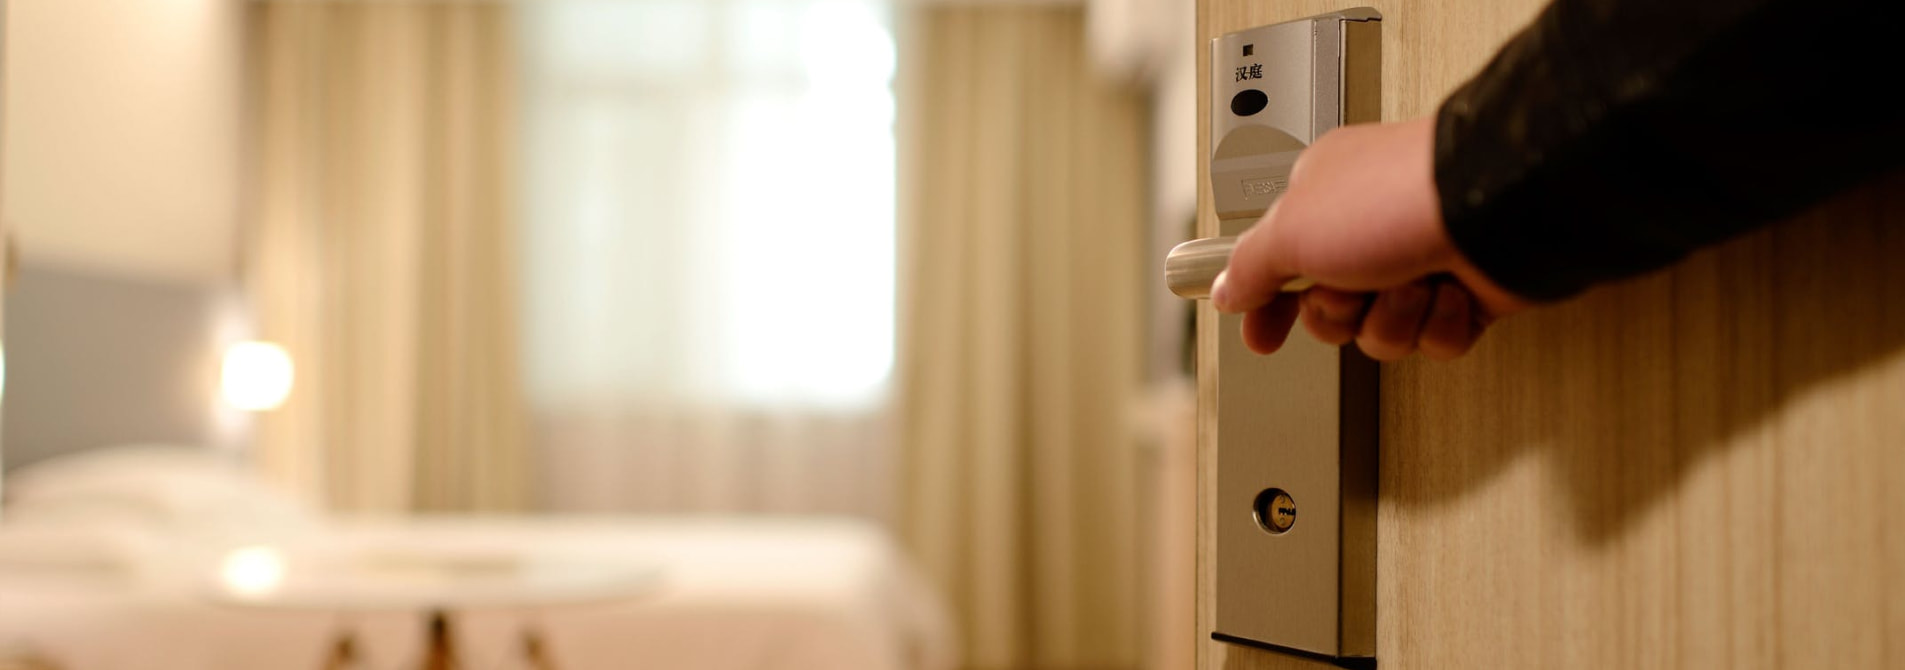 Hotel sourcing expert header